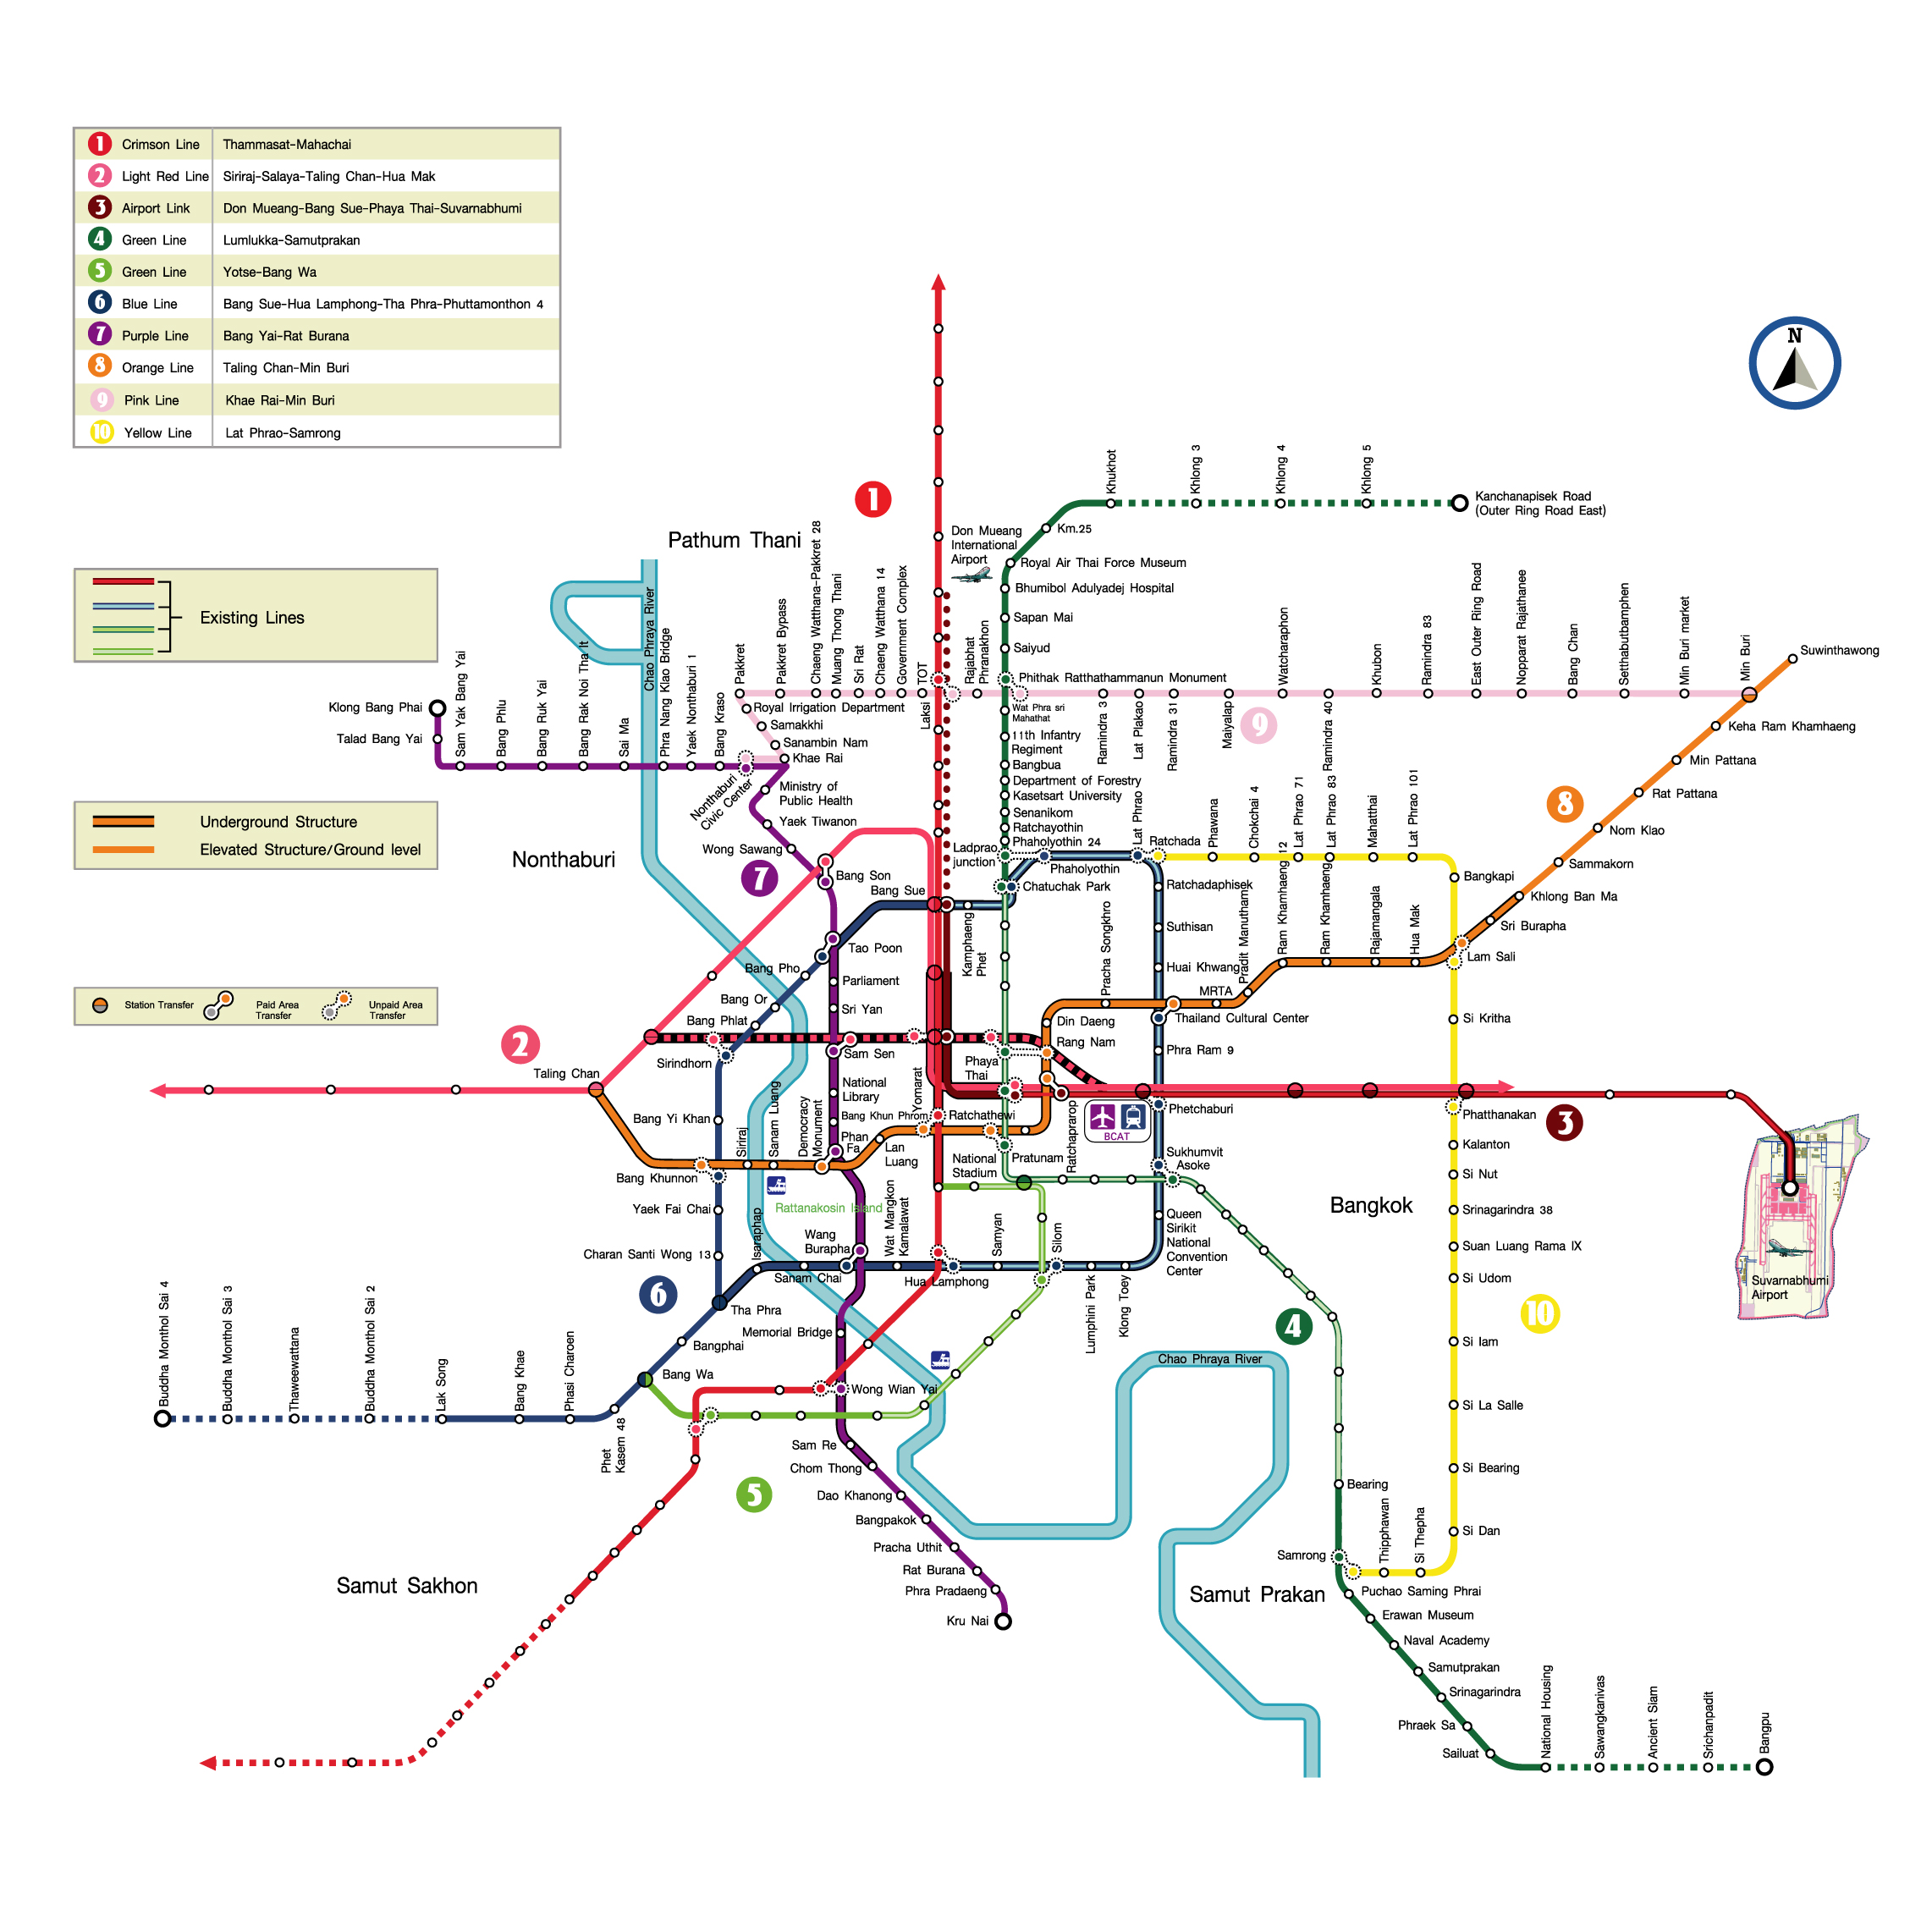 バンコク都市圏公共交通機関基本計画の完成予想図 出典:Mass Rapid Transit Authority of Thailand